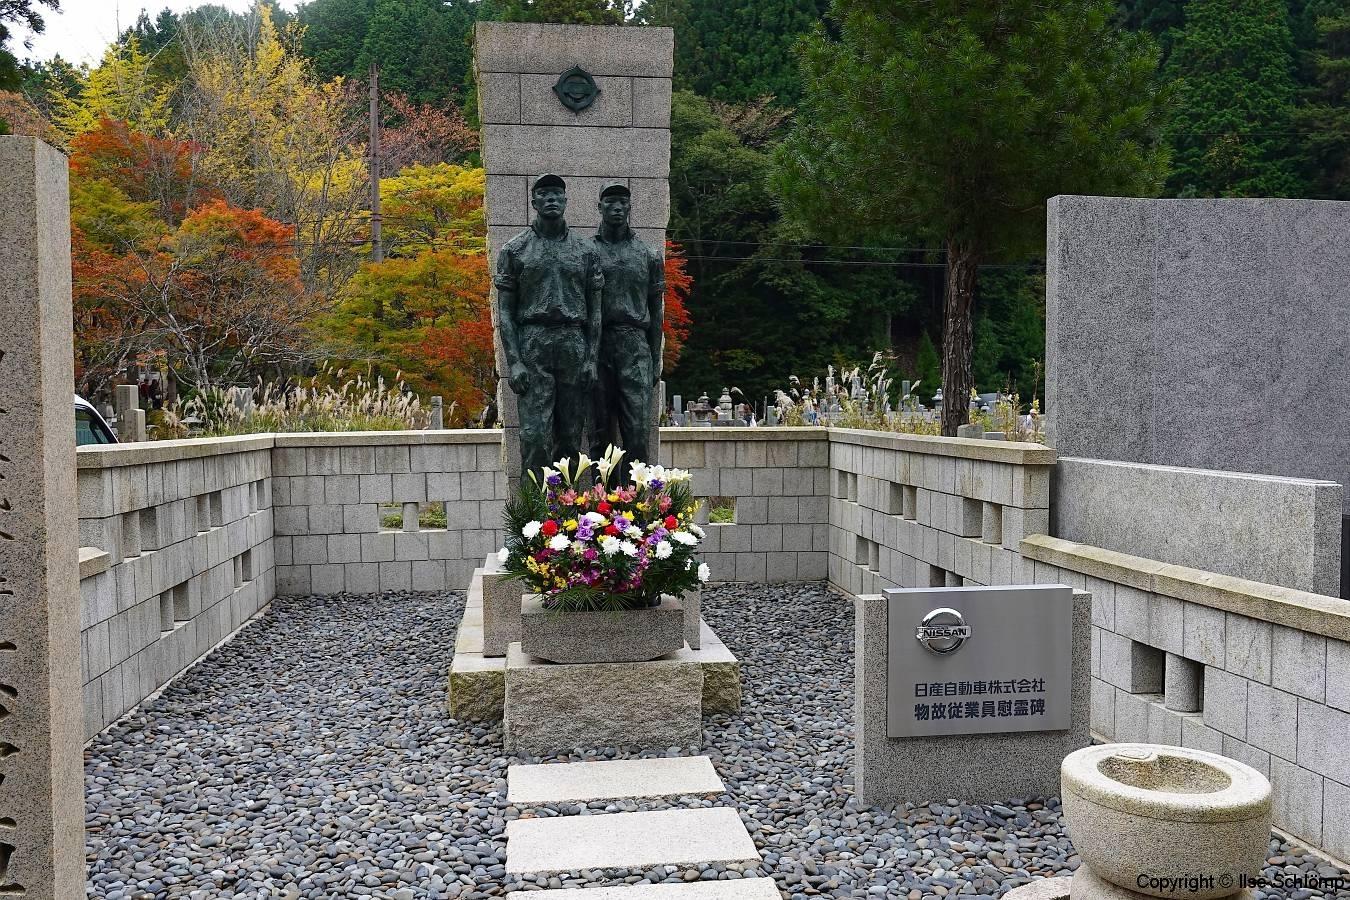 Japan, Koya-san, Friedhof Oku-no-in, Firmengrab Nissan Automobile